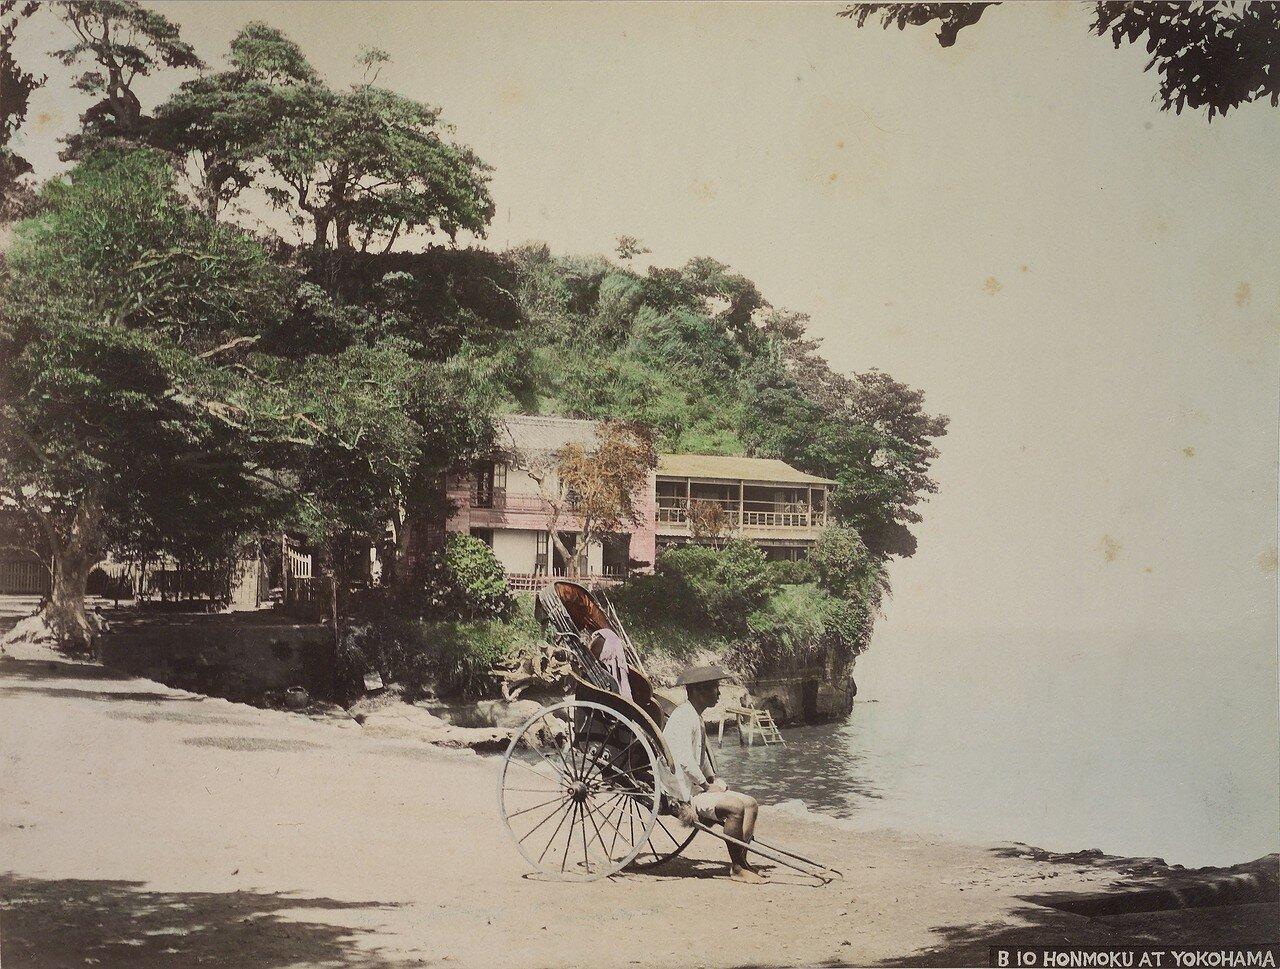 Иокогама. Хонмоку